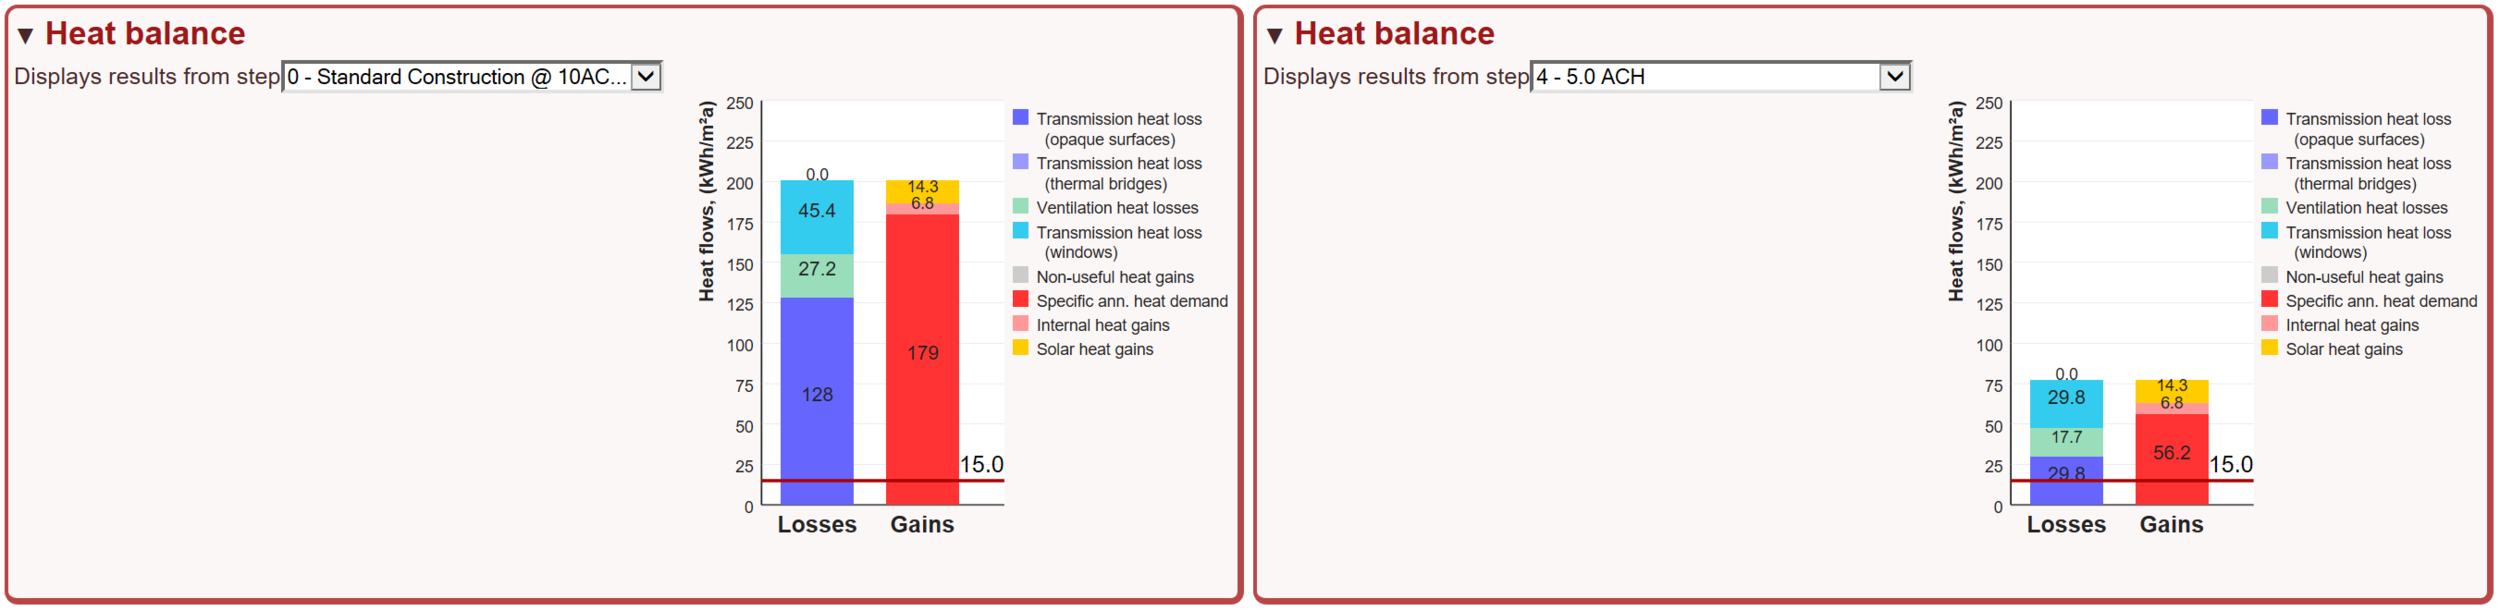 191015_Heat Balance Charts.png